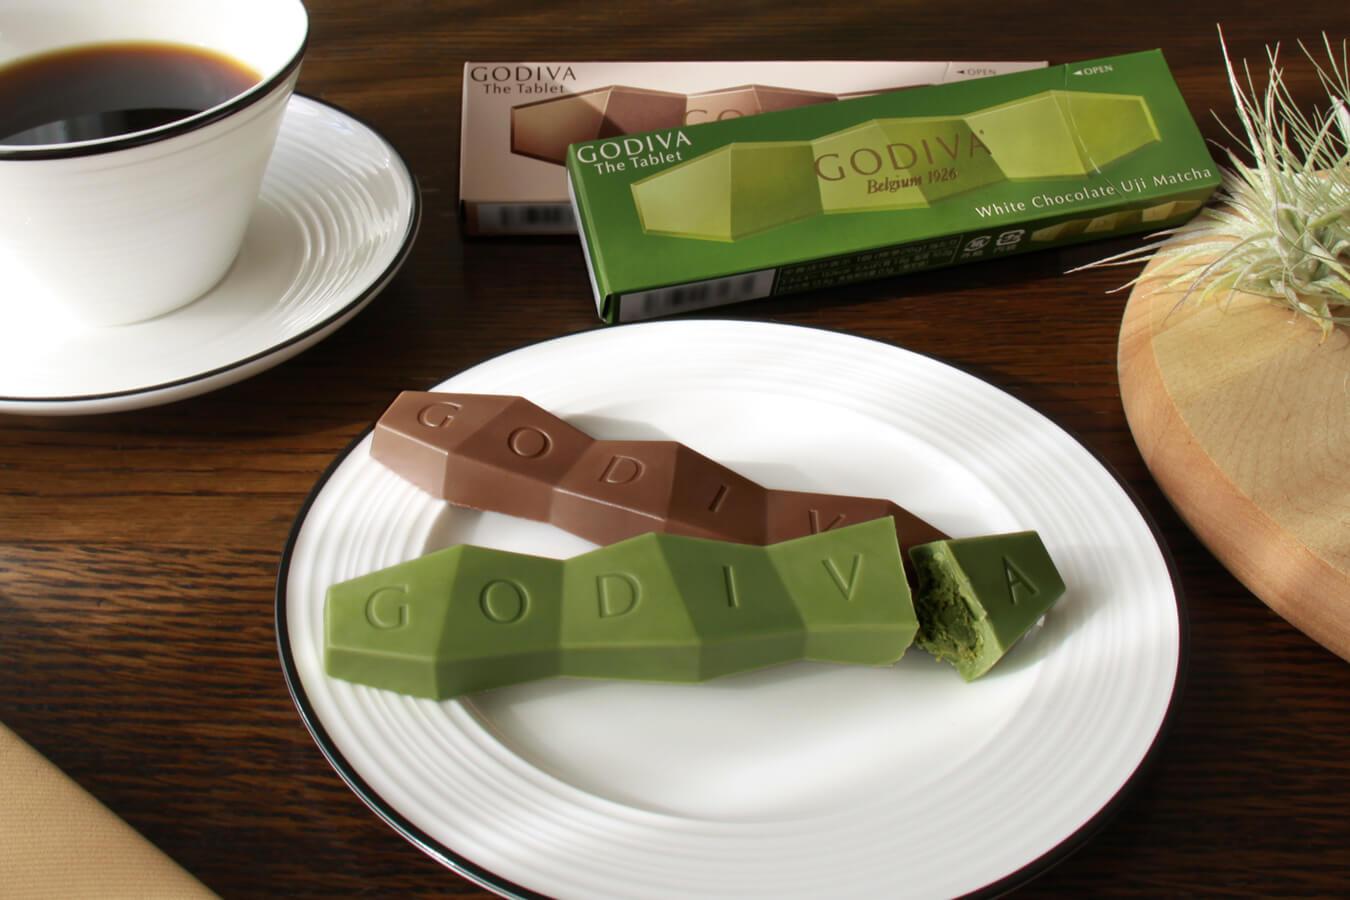 日本711「GODIVA The Tablet」白巧克力宇治抹茶味登場 抹茶_、